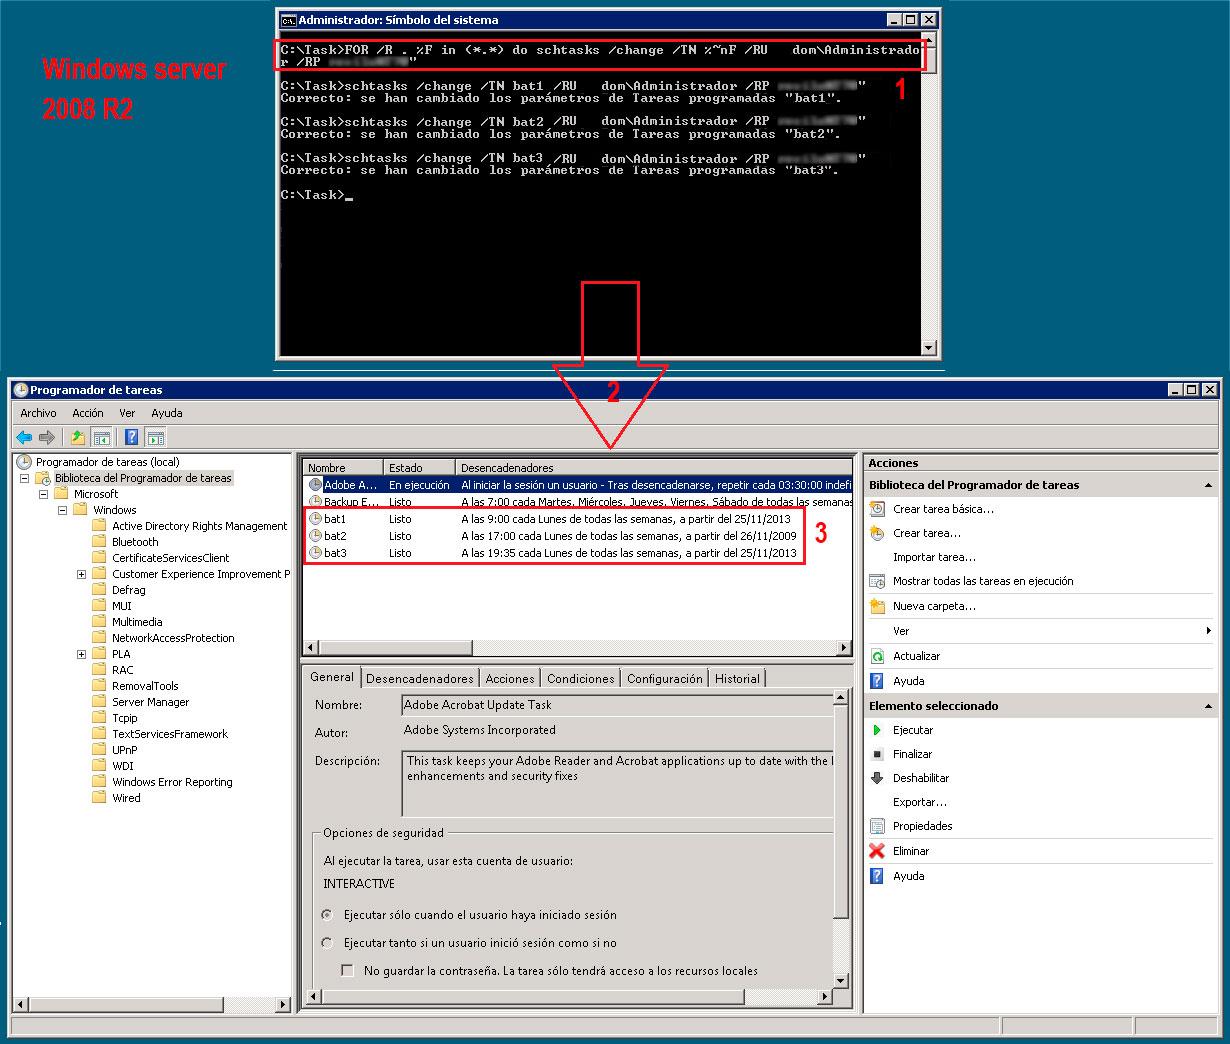 Pantallazos.es: Windows server 2003: Transferir tareas programadas ...